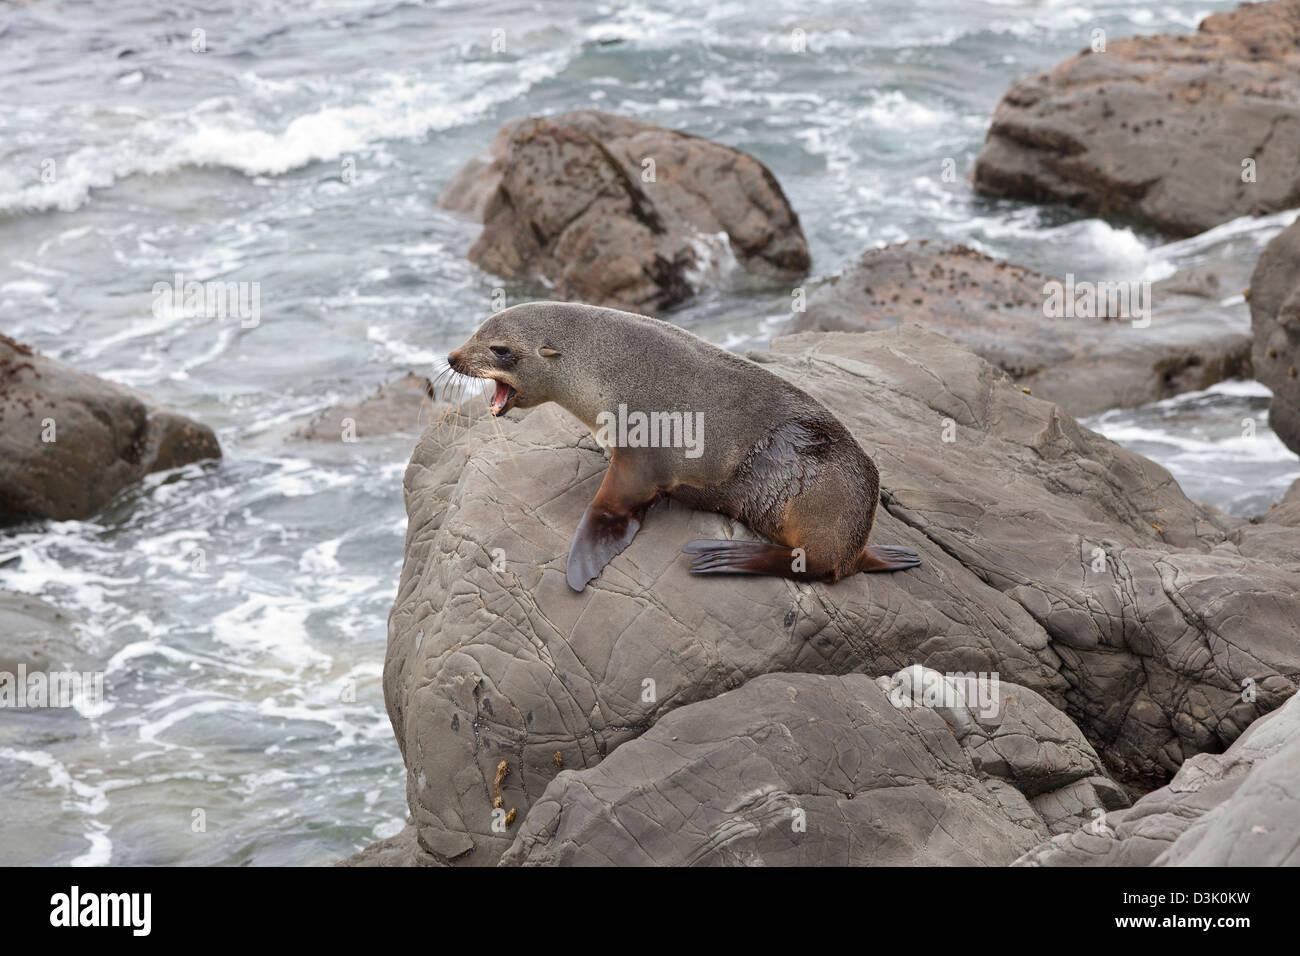 Fur seal on the cliffs near Kaikoura, New Zealand - Stock Image